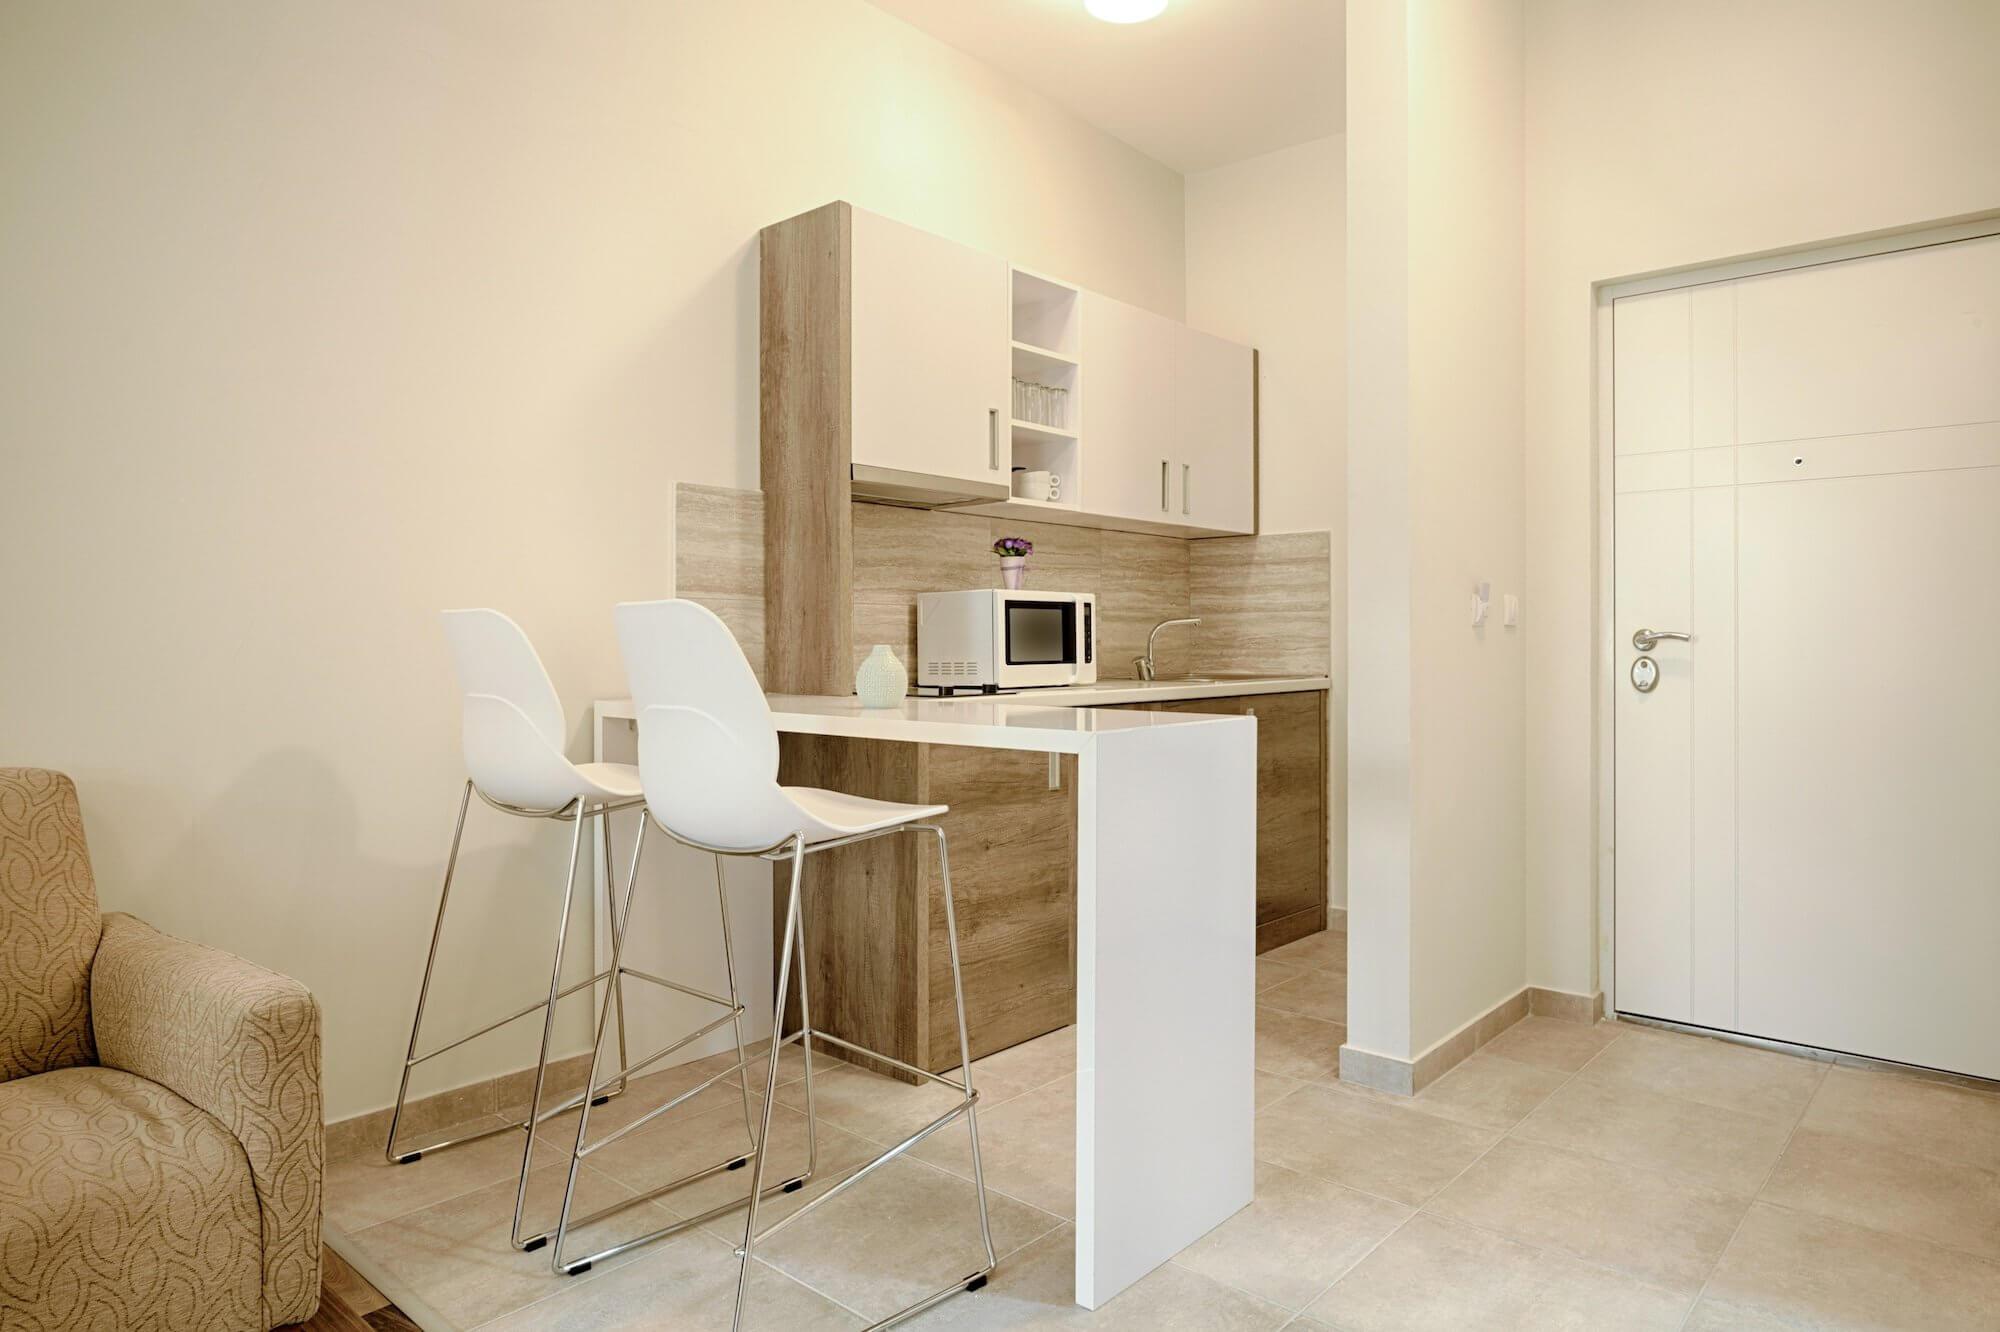 Interior Of A Small Apartment Kitchen